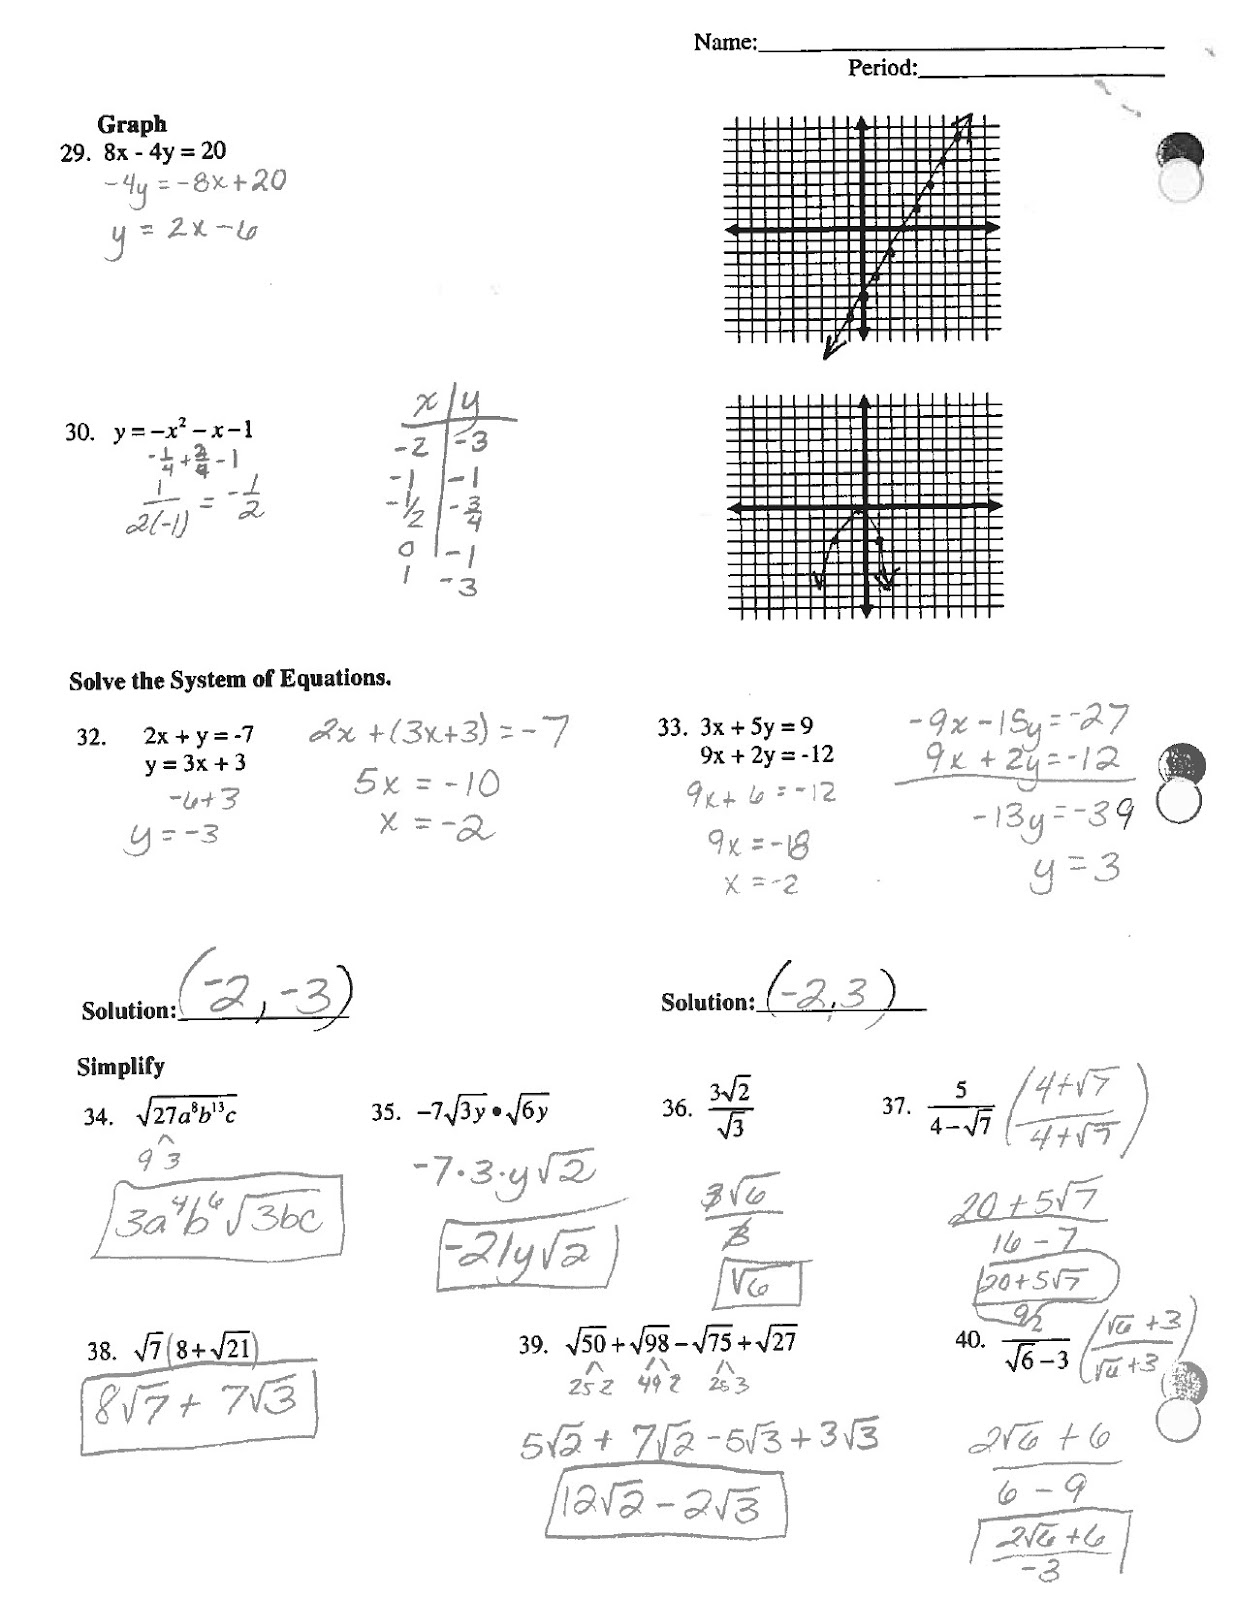 math classes spring 2012 intermediate algebra chapter 11 pre test. Black Bedroom Furniture Sets. Home Design Ideas